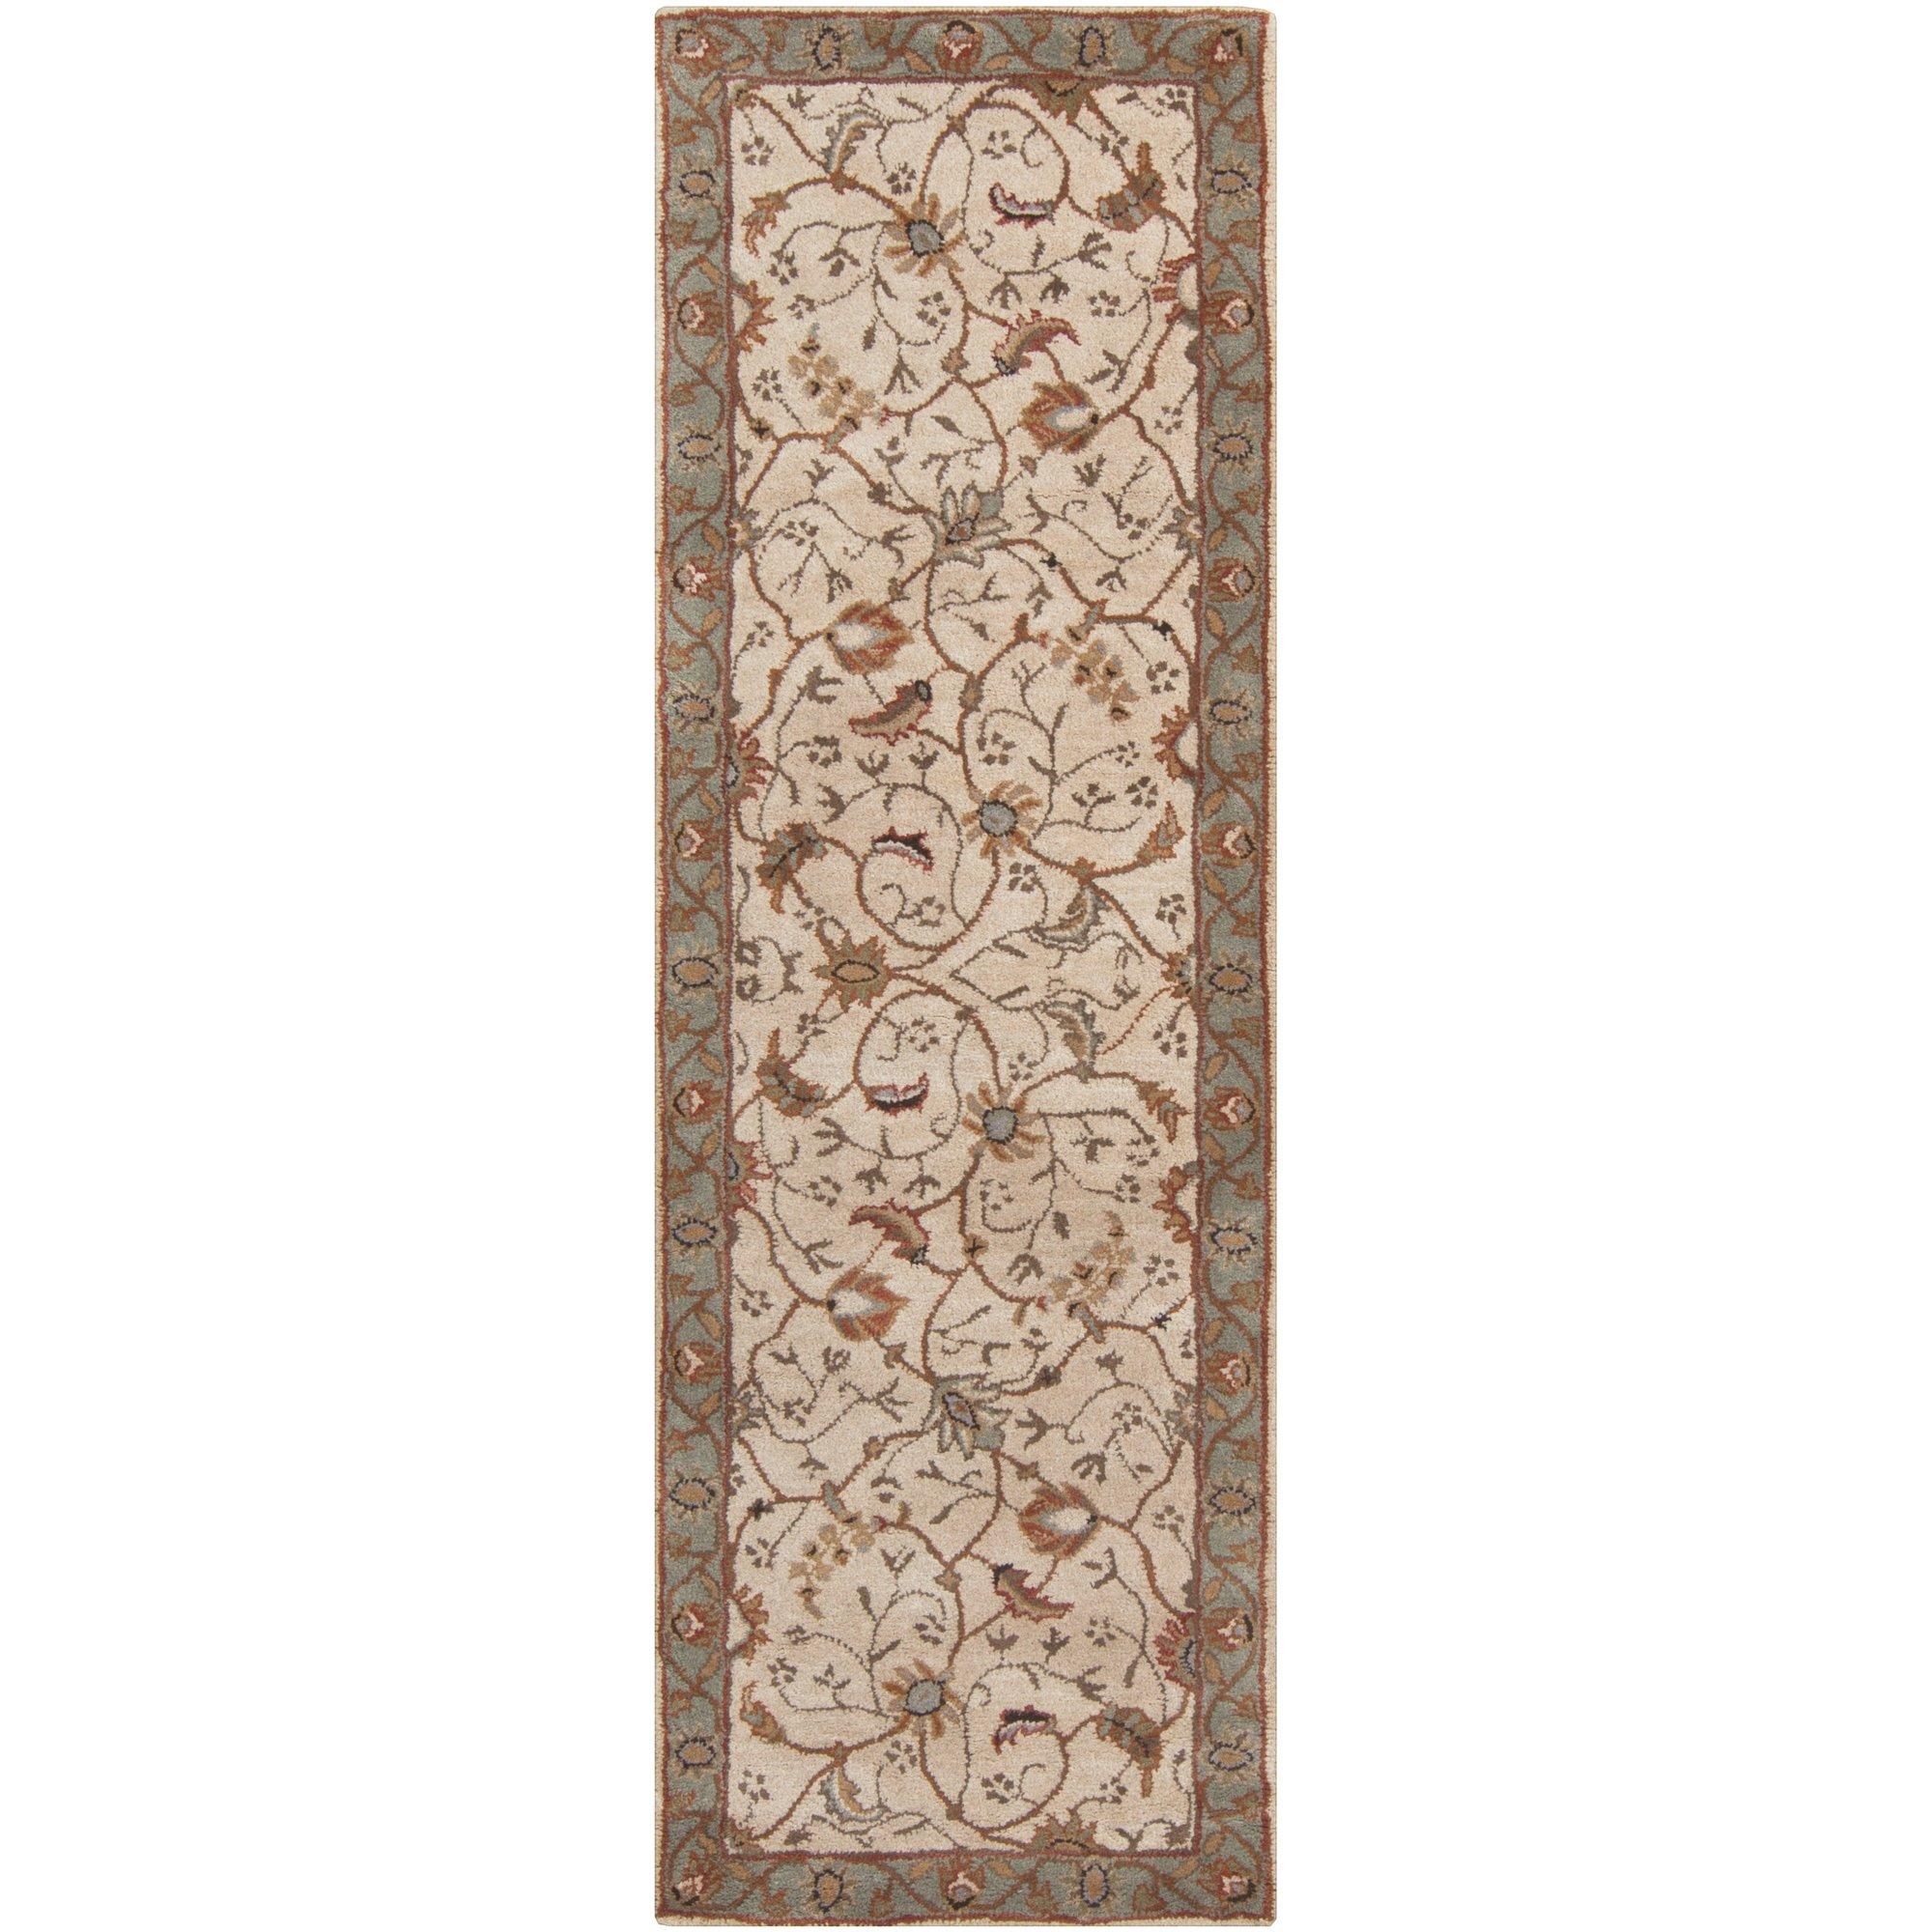 Surya Caesar CAE-1088 Classic Hand Tufted 100% Wool Dark Olive Green 2'6'' x 8' Traditional Runner